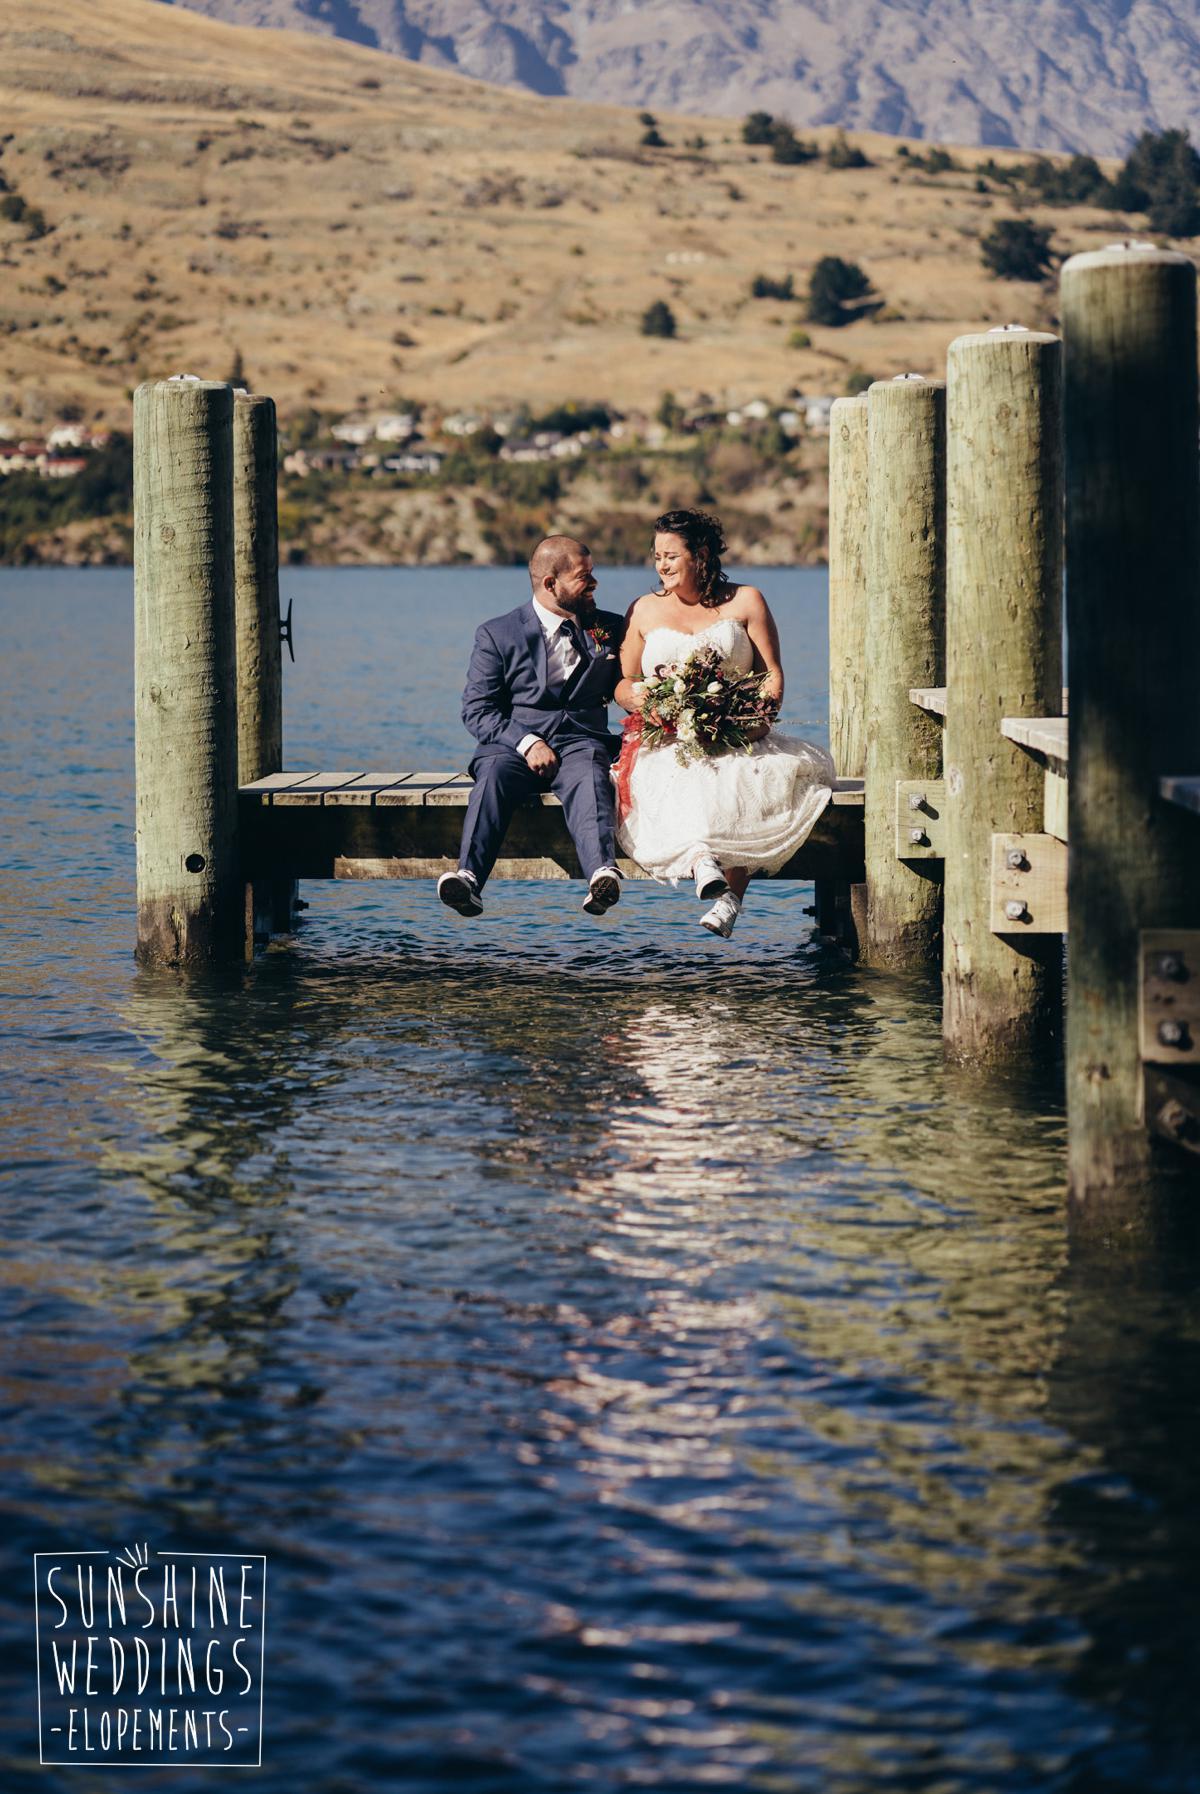 jetty wedding photo by the lake